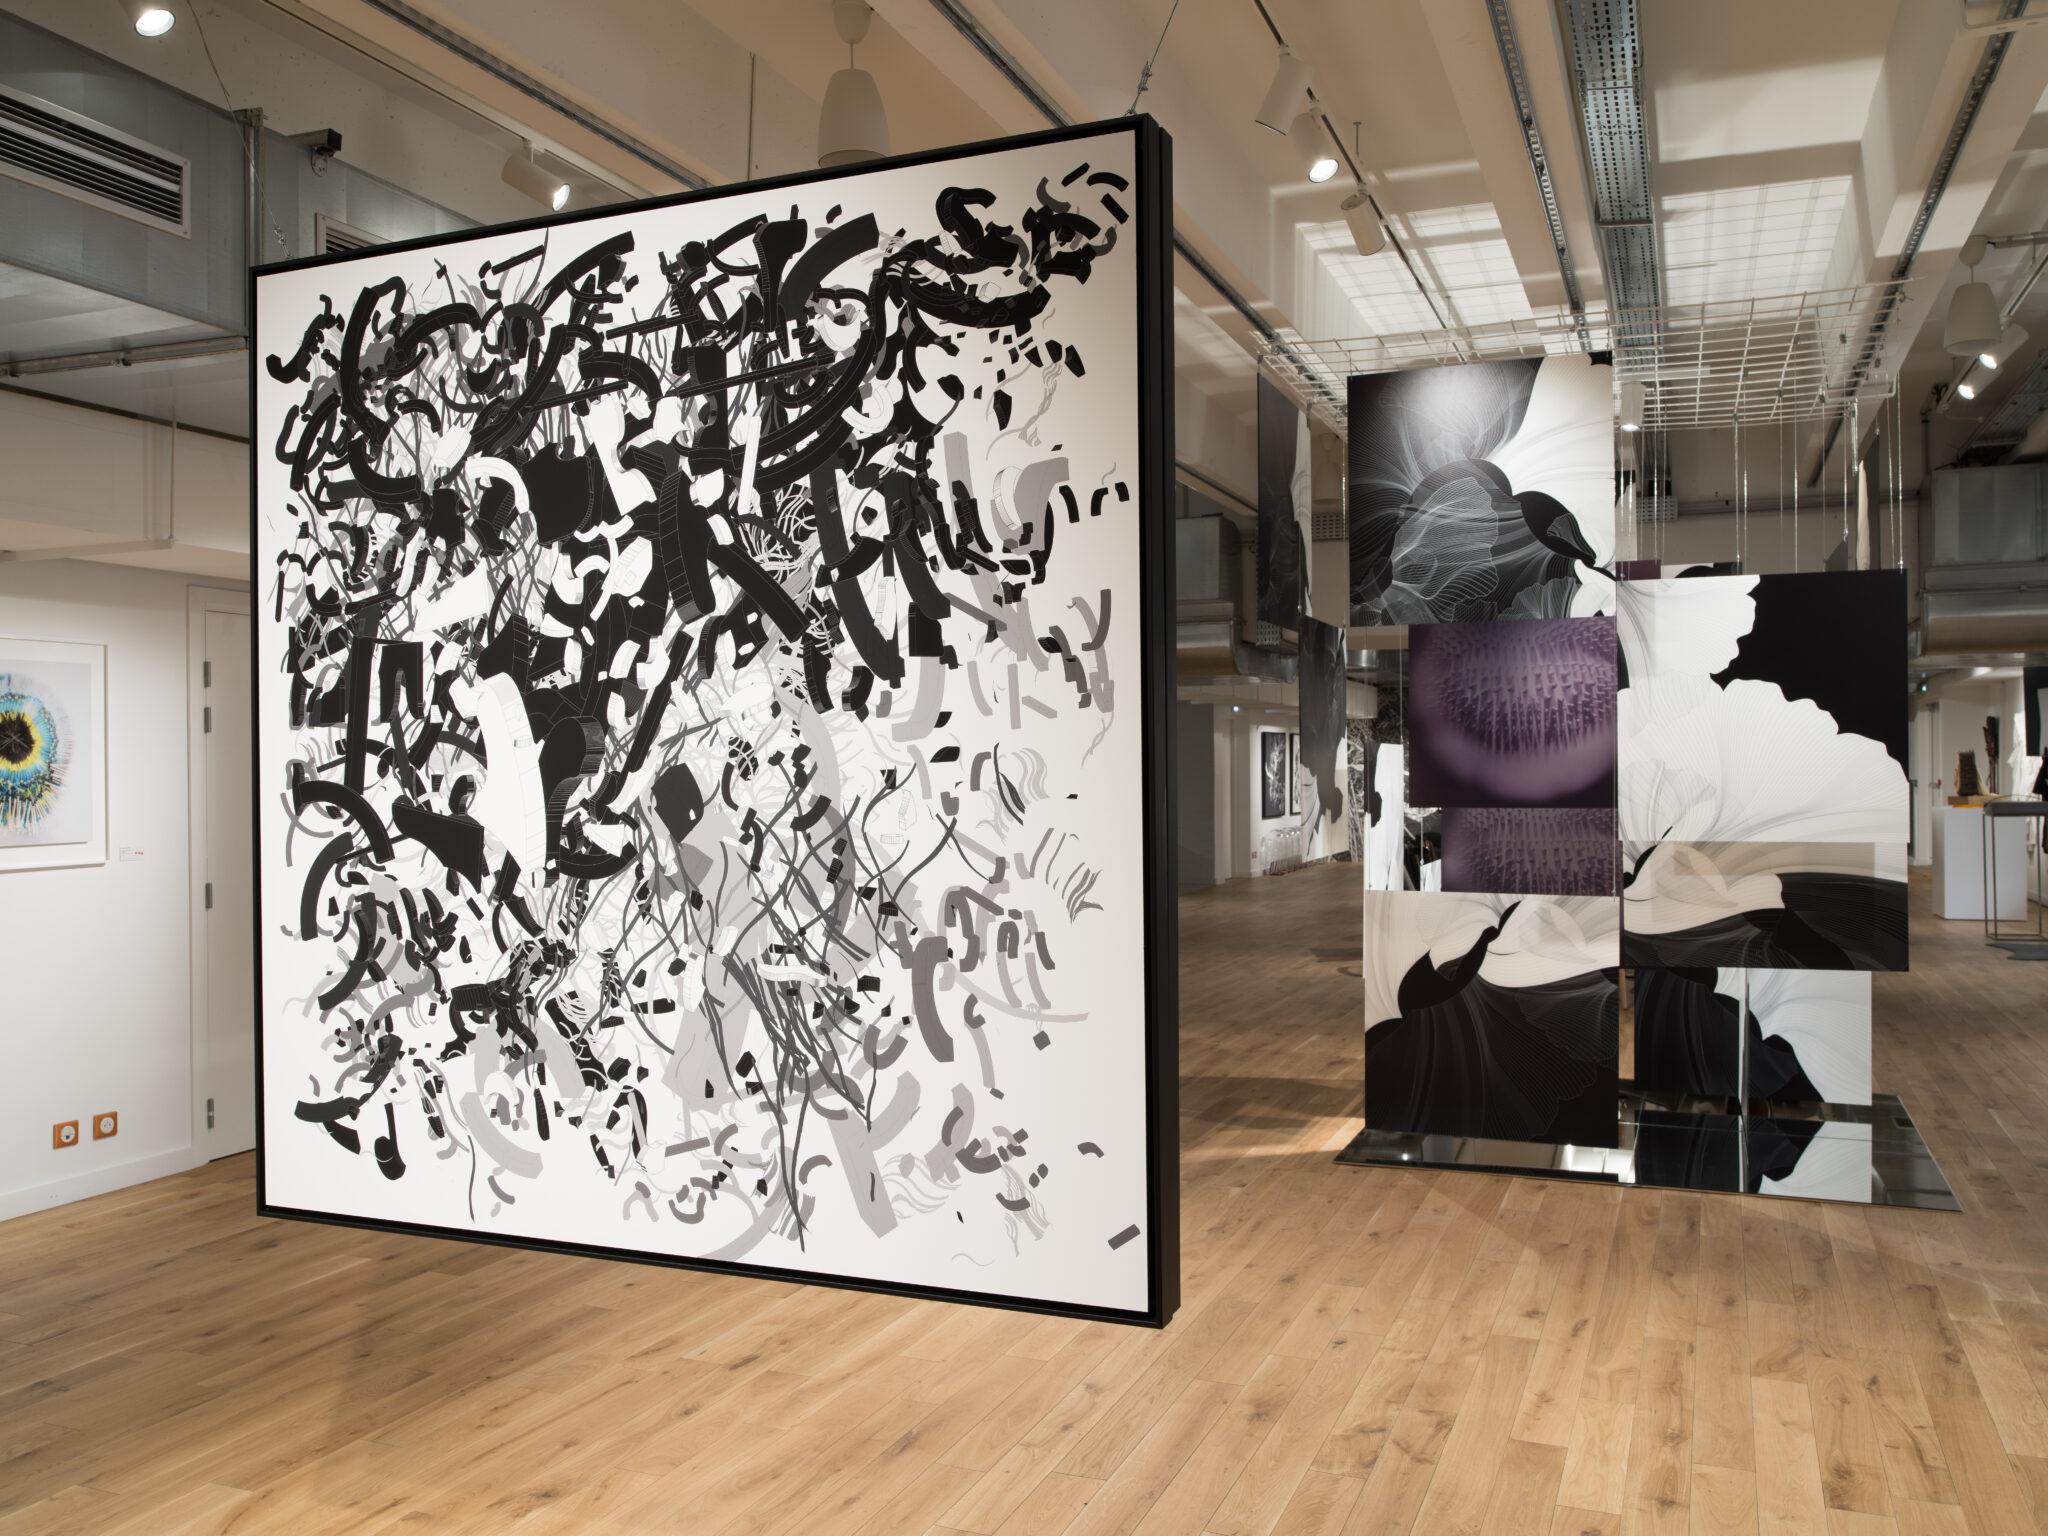 audrey-hatchikian-gallery-flagrant-délire-sacha-haillote-rodolphe-barsikian-exposition-art-contemporain